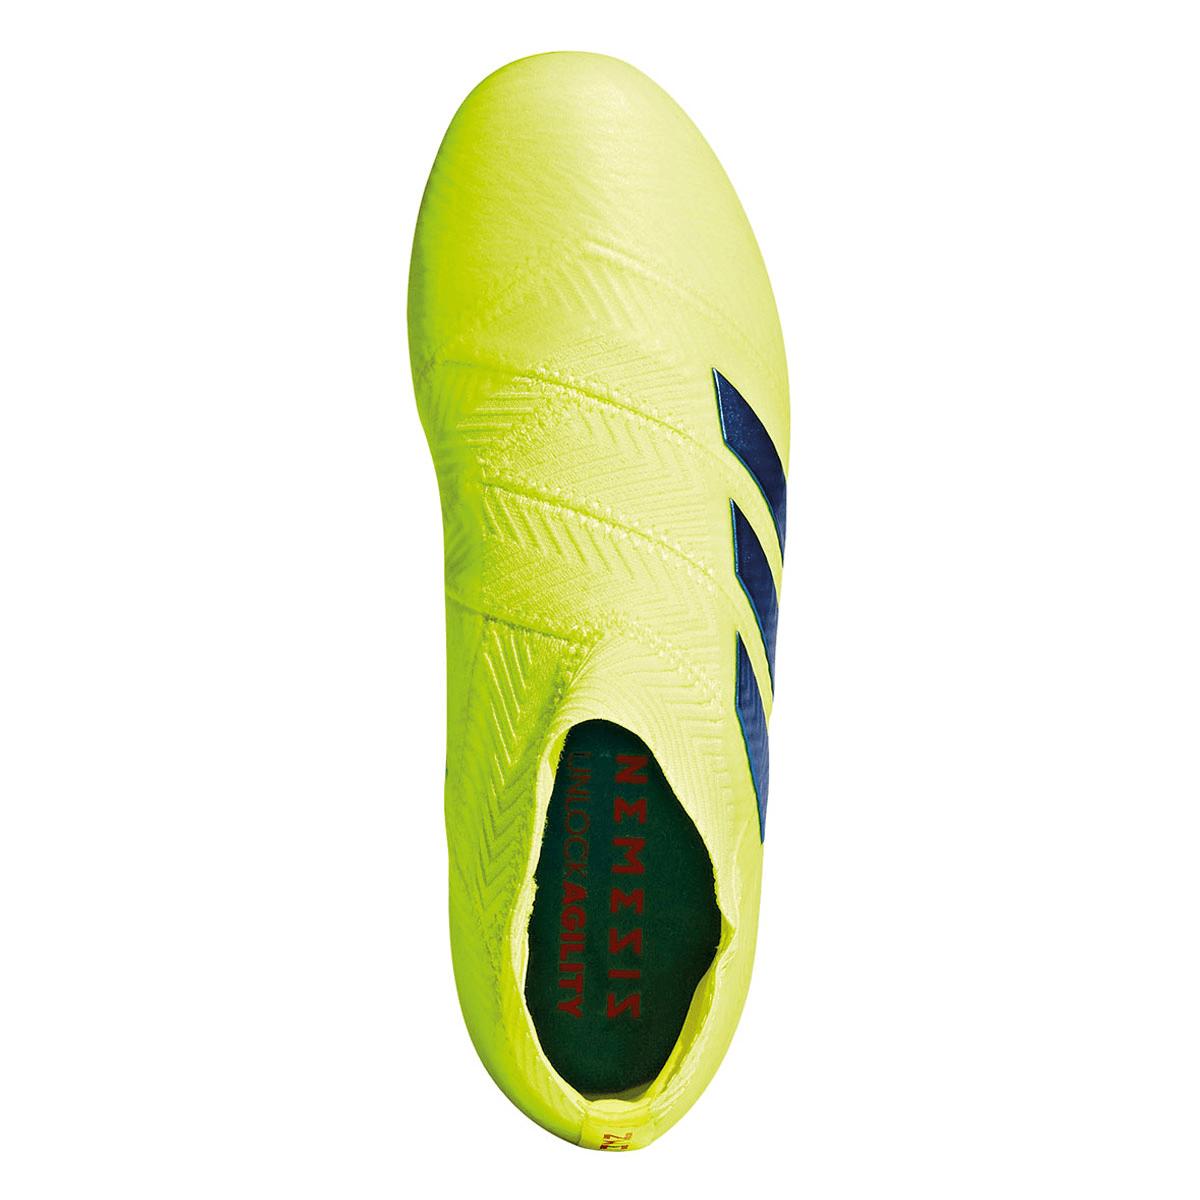 J adidas 18FG Fußballschuh Kinder fluoblau Nemeziz gelb pzqMSUV